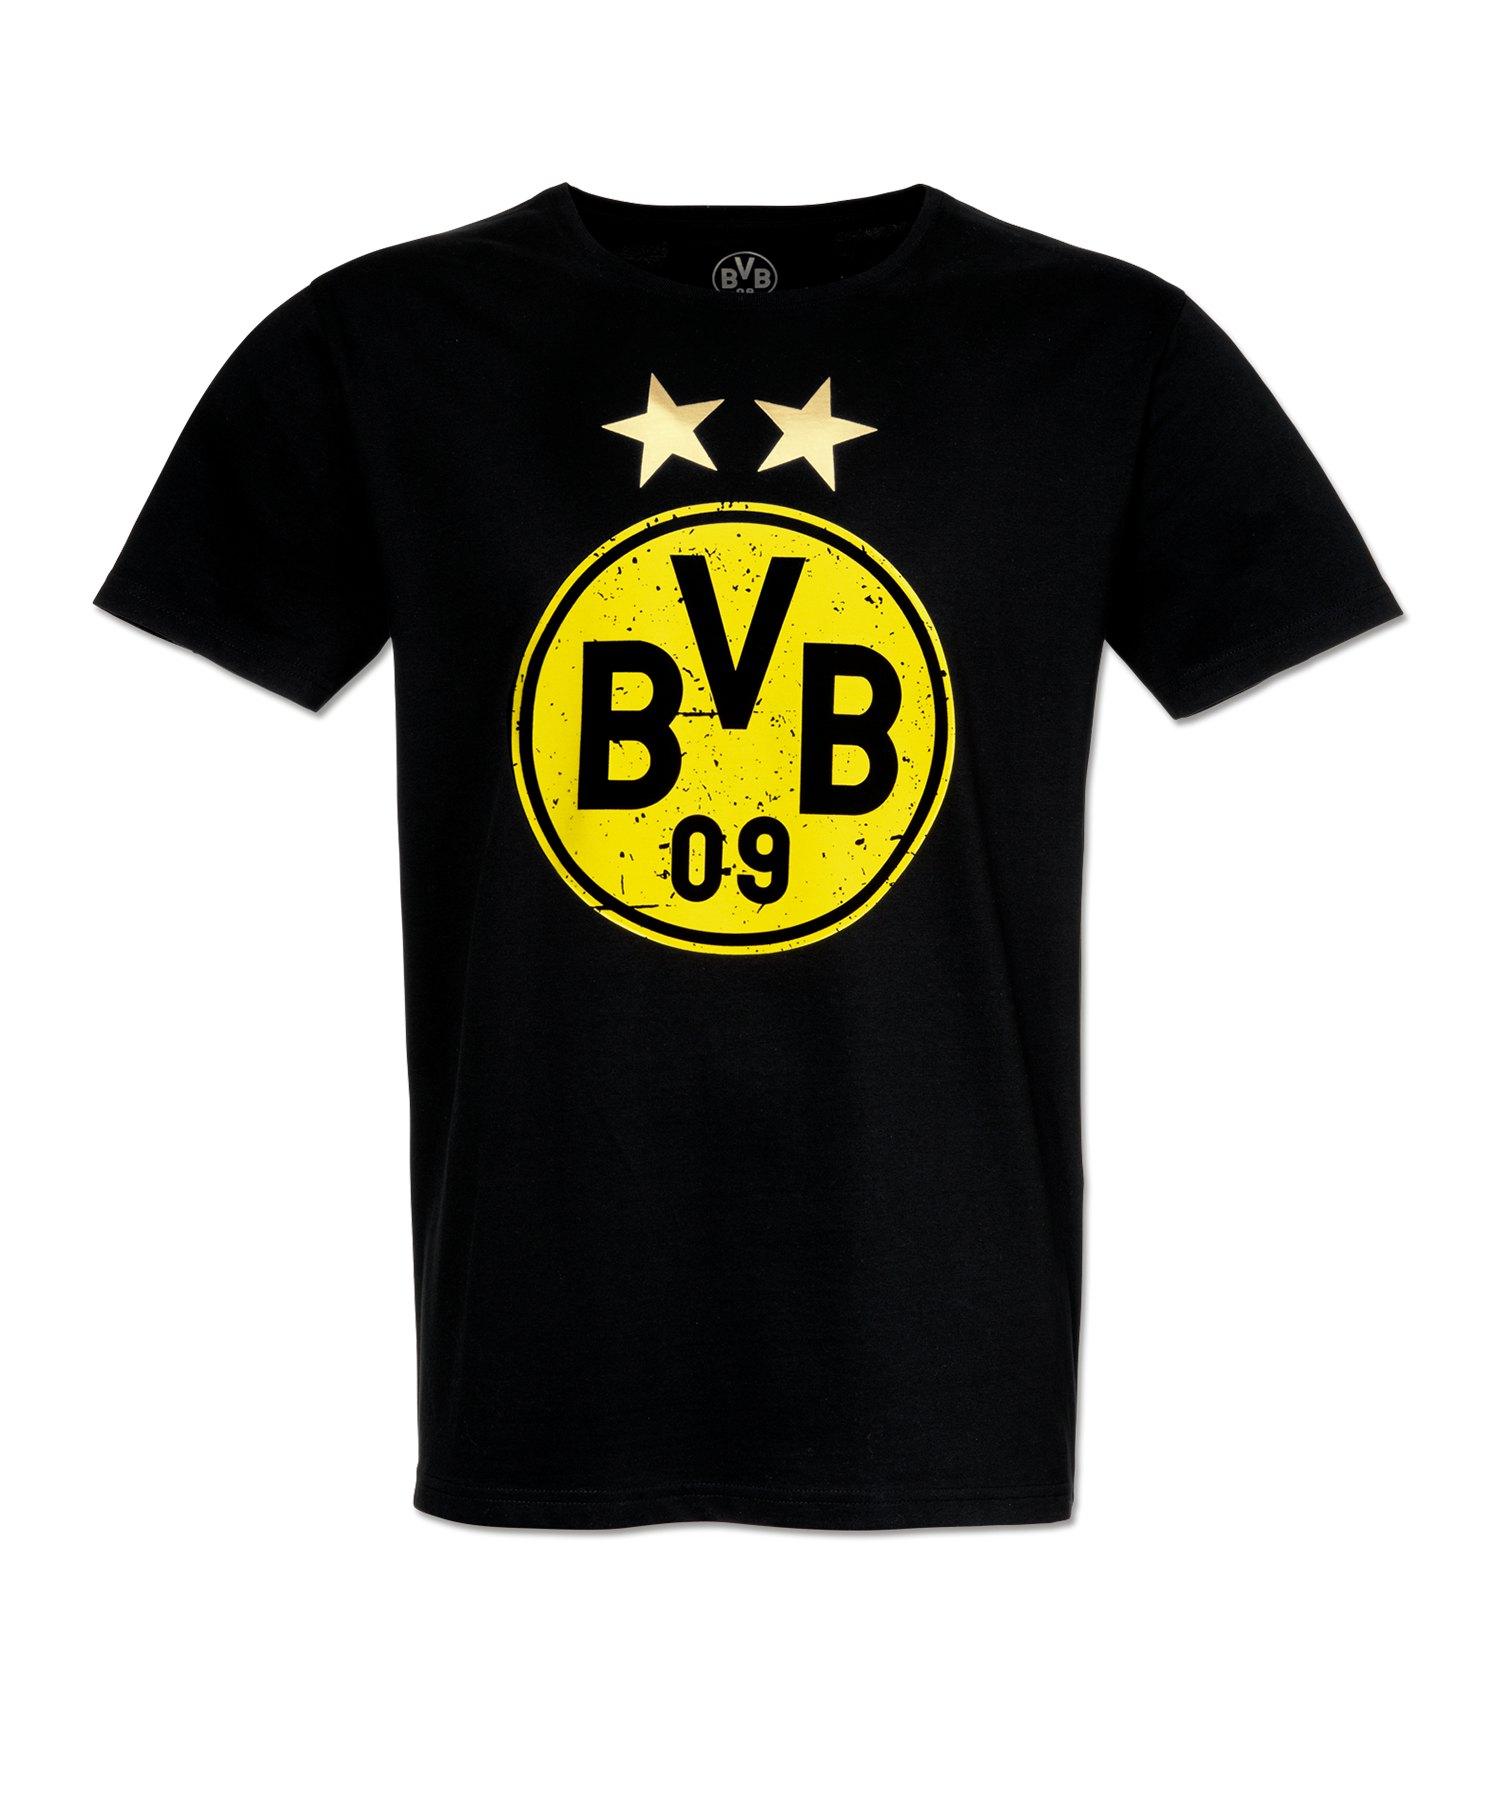 BVB Borussia Dortmund Logo T-Shirt Schwarz - schwarz